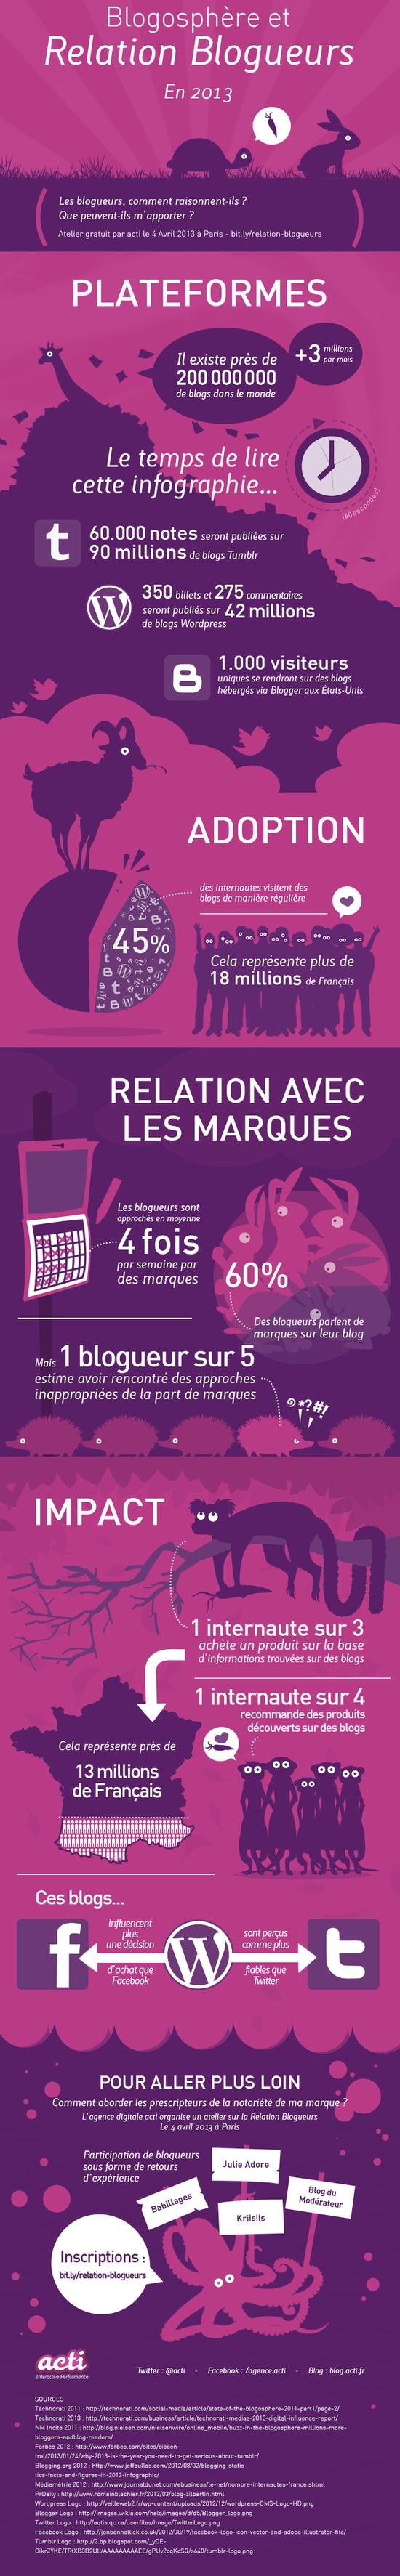 blogosphere-et-relation-blogueurs